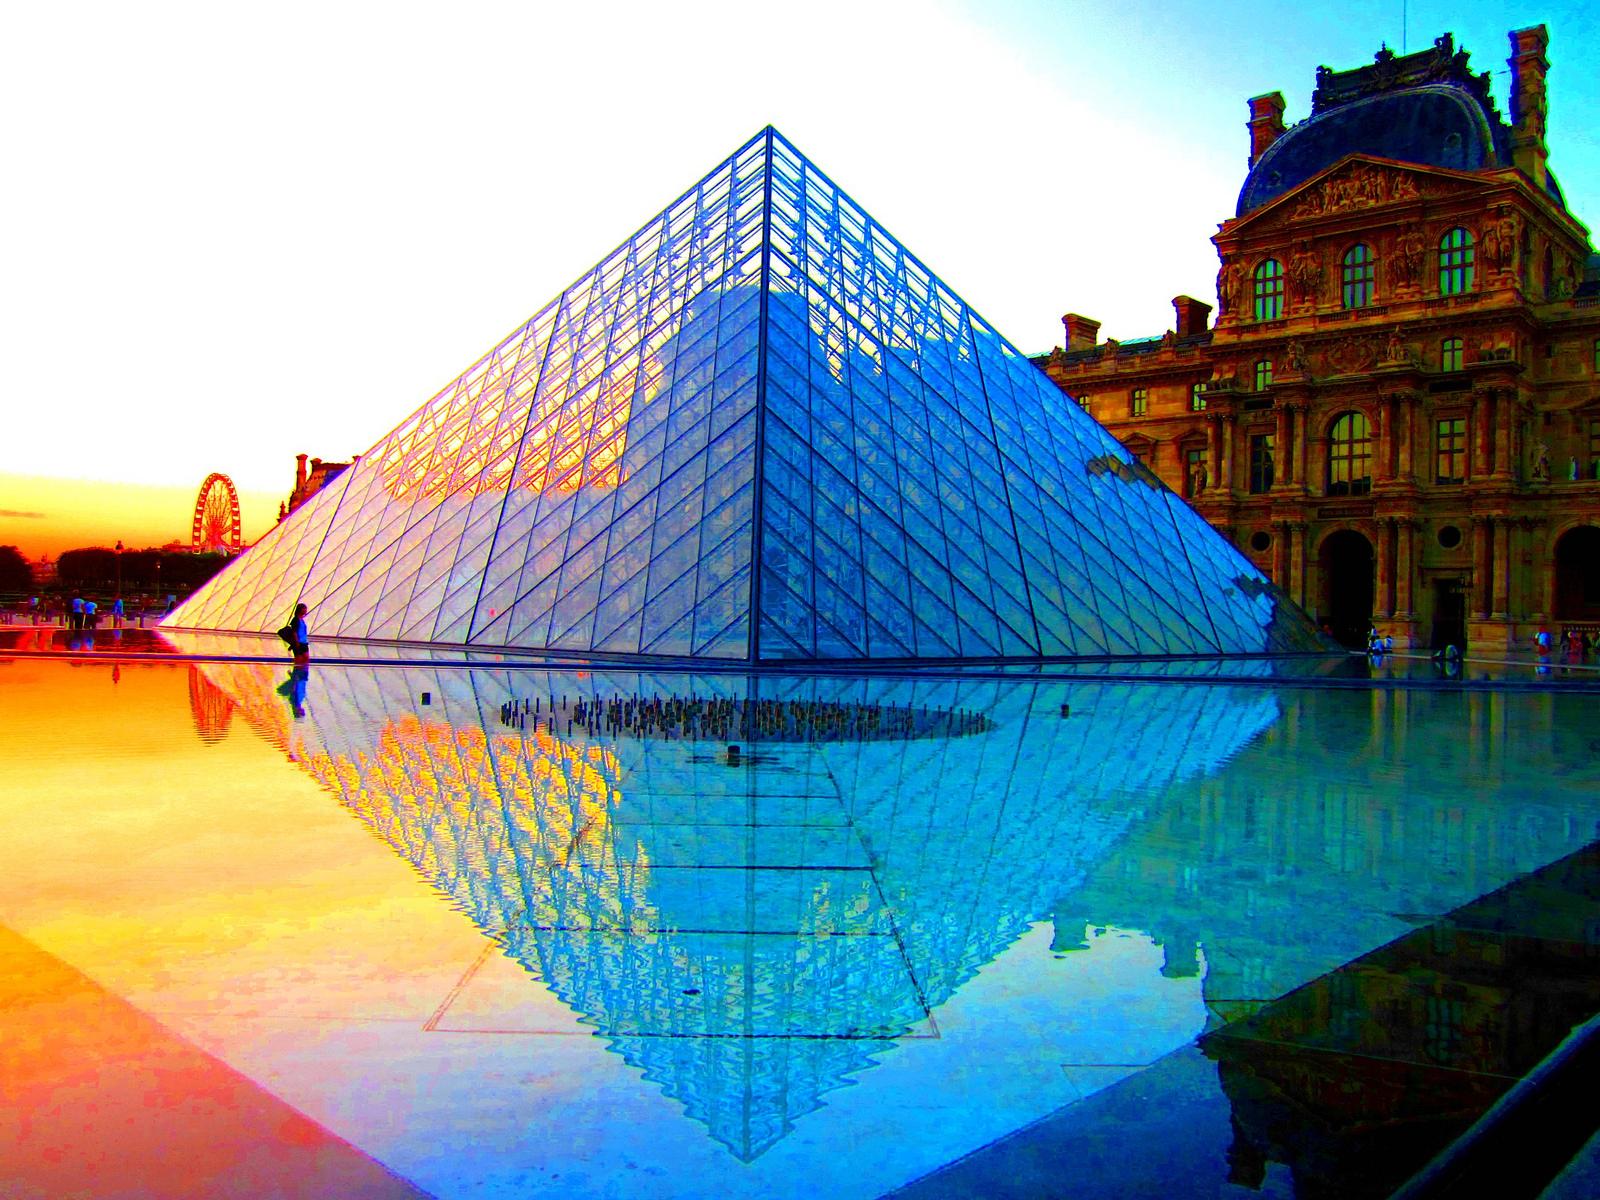 Sunset at the Louvre, Paris, France